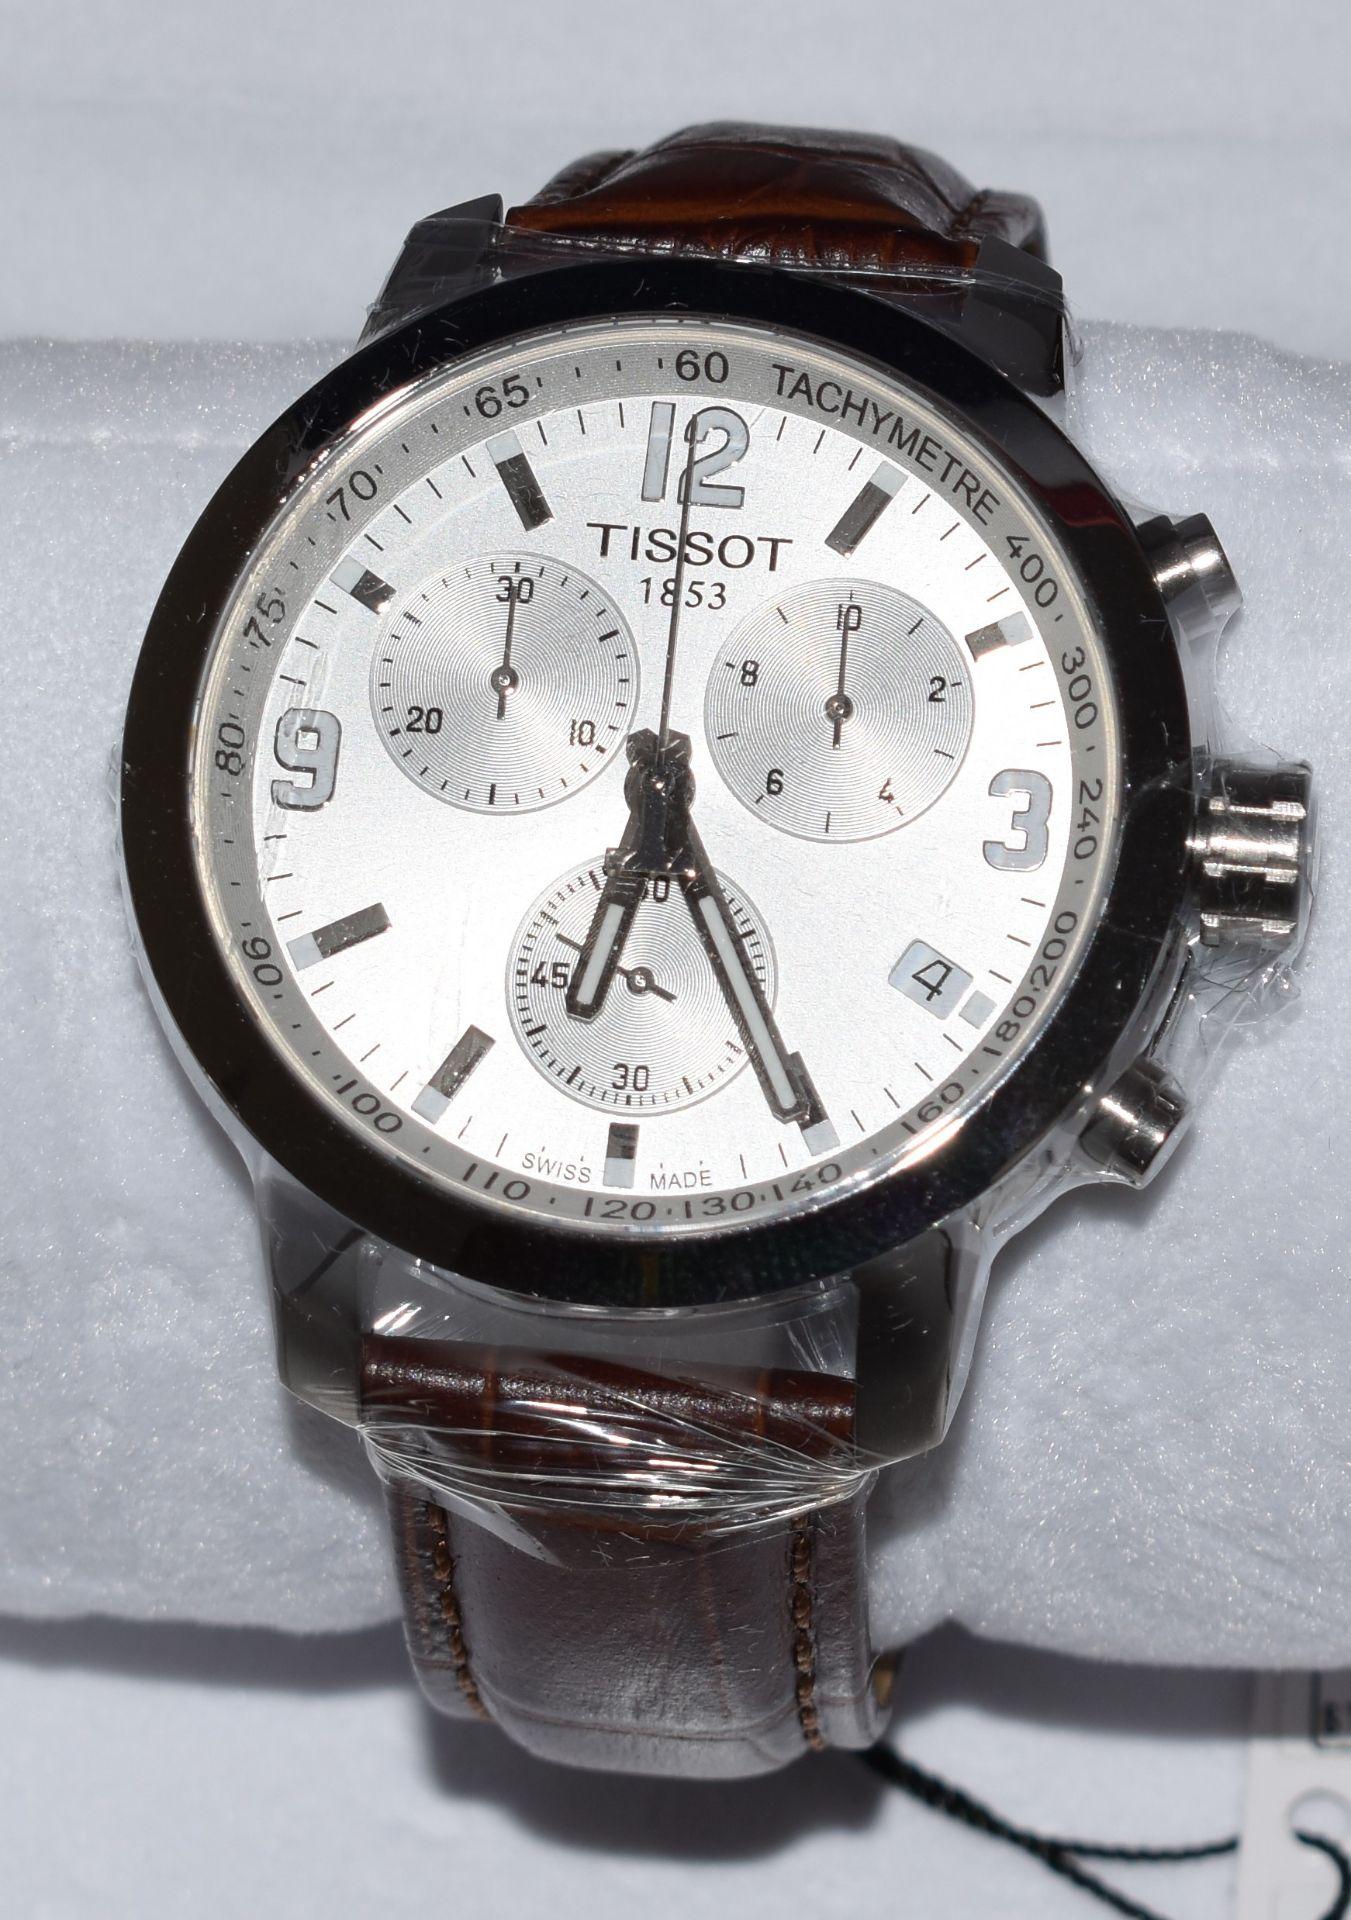 Tissot Men's Watch TO55.417.16.037.00 - Image 2 of 3